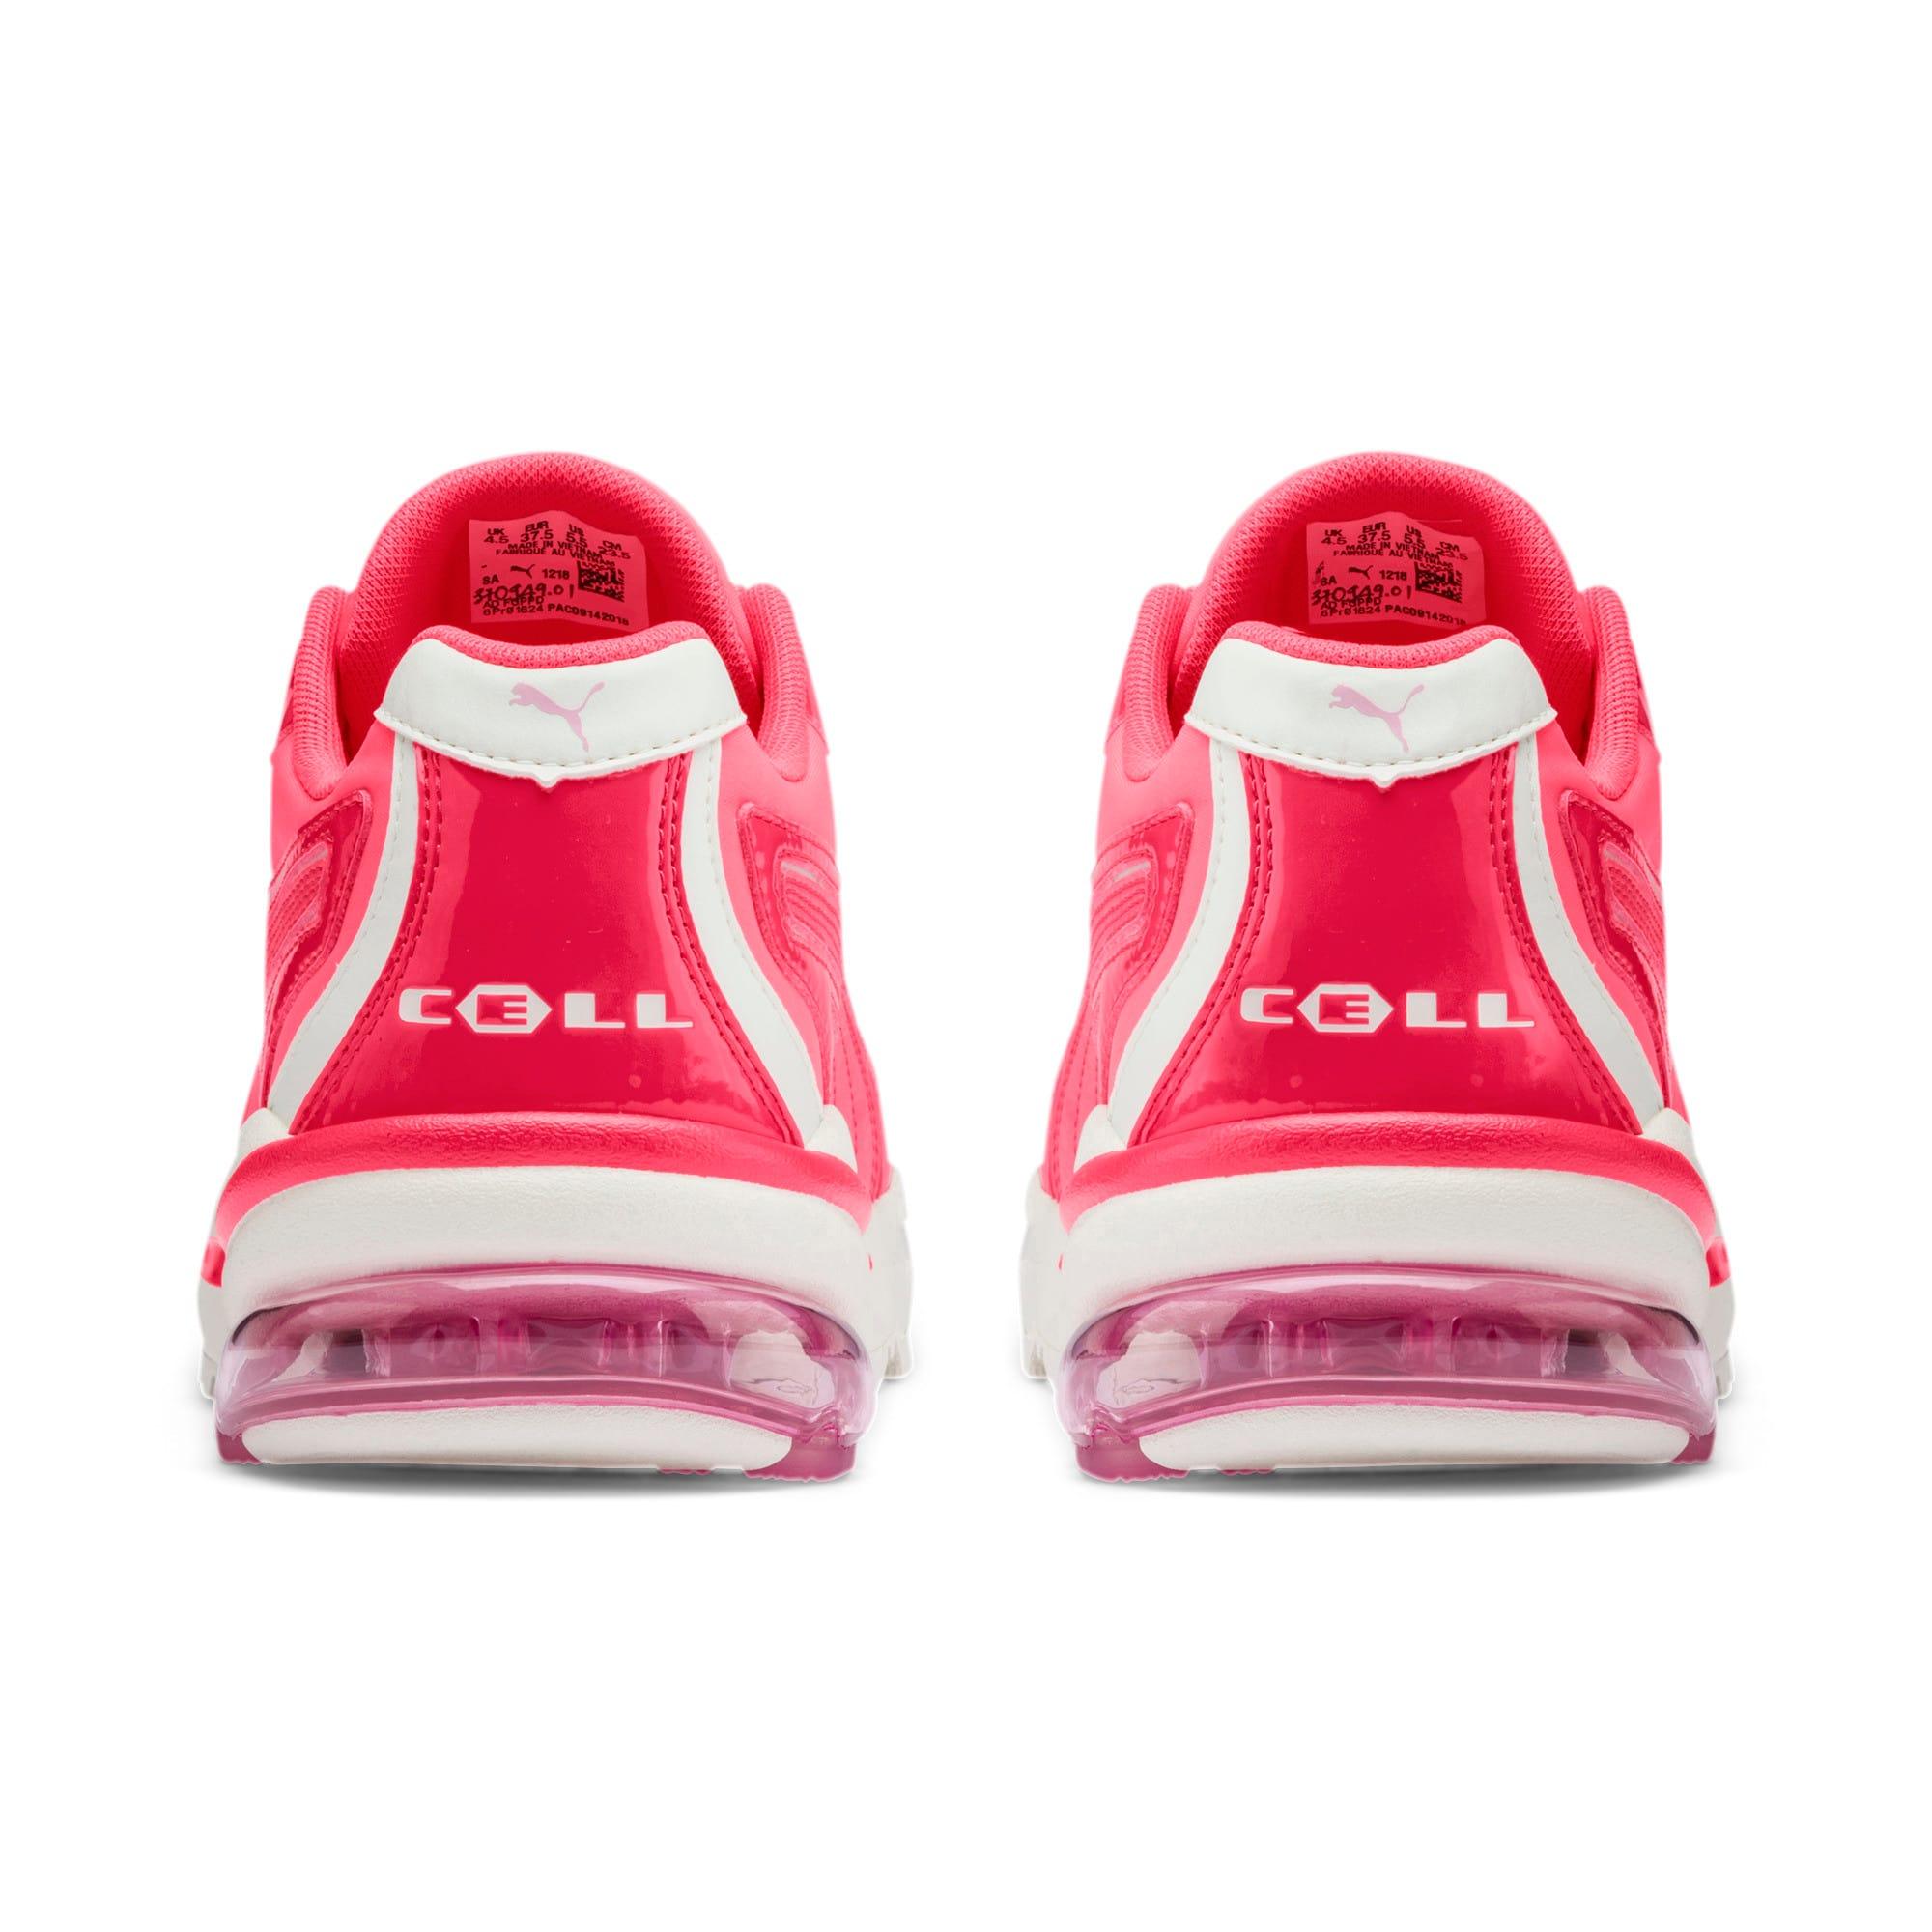 Thumbnail 4 of CELL Stellar Neon Women's Sneakers, Pink Alert-Heather, medium